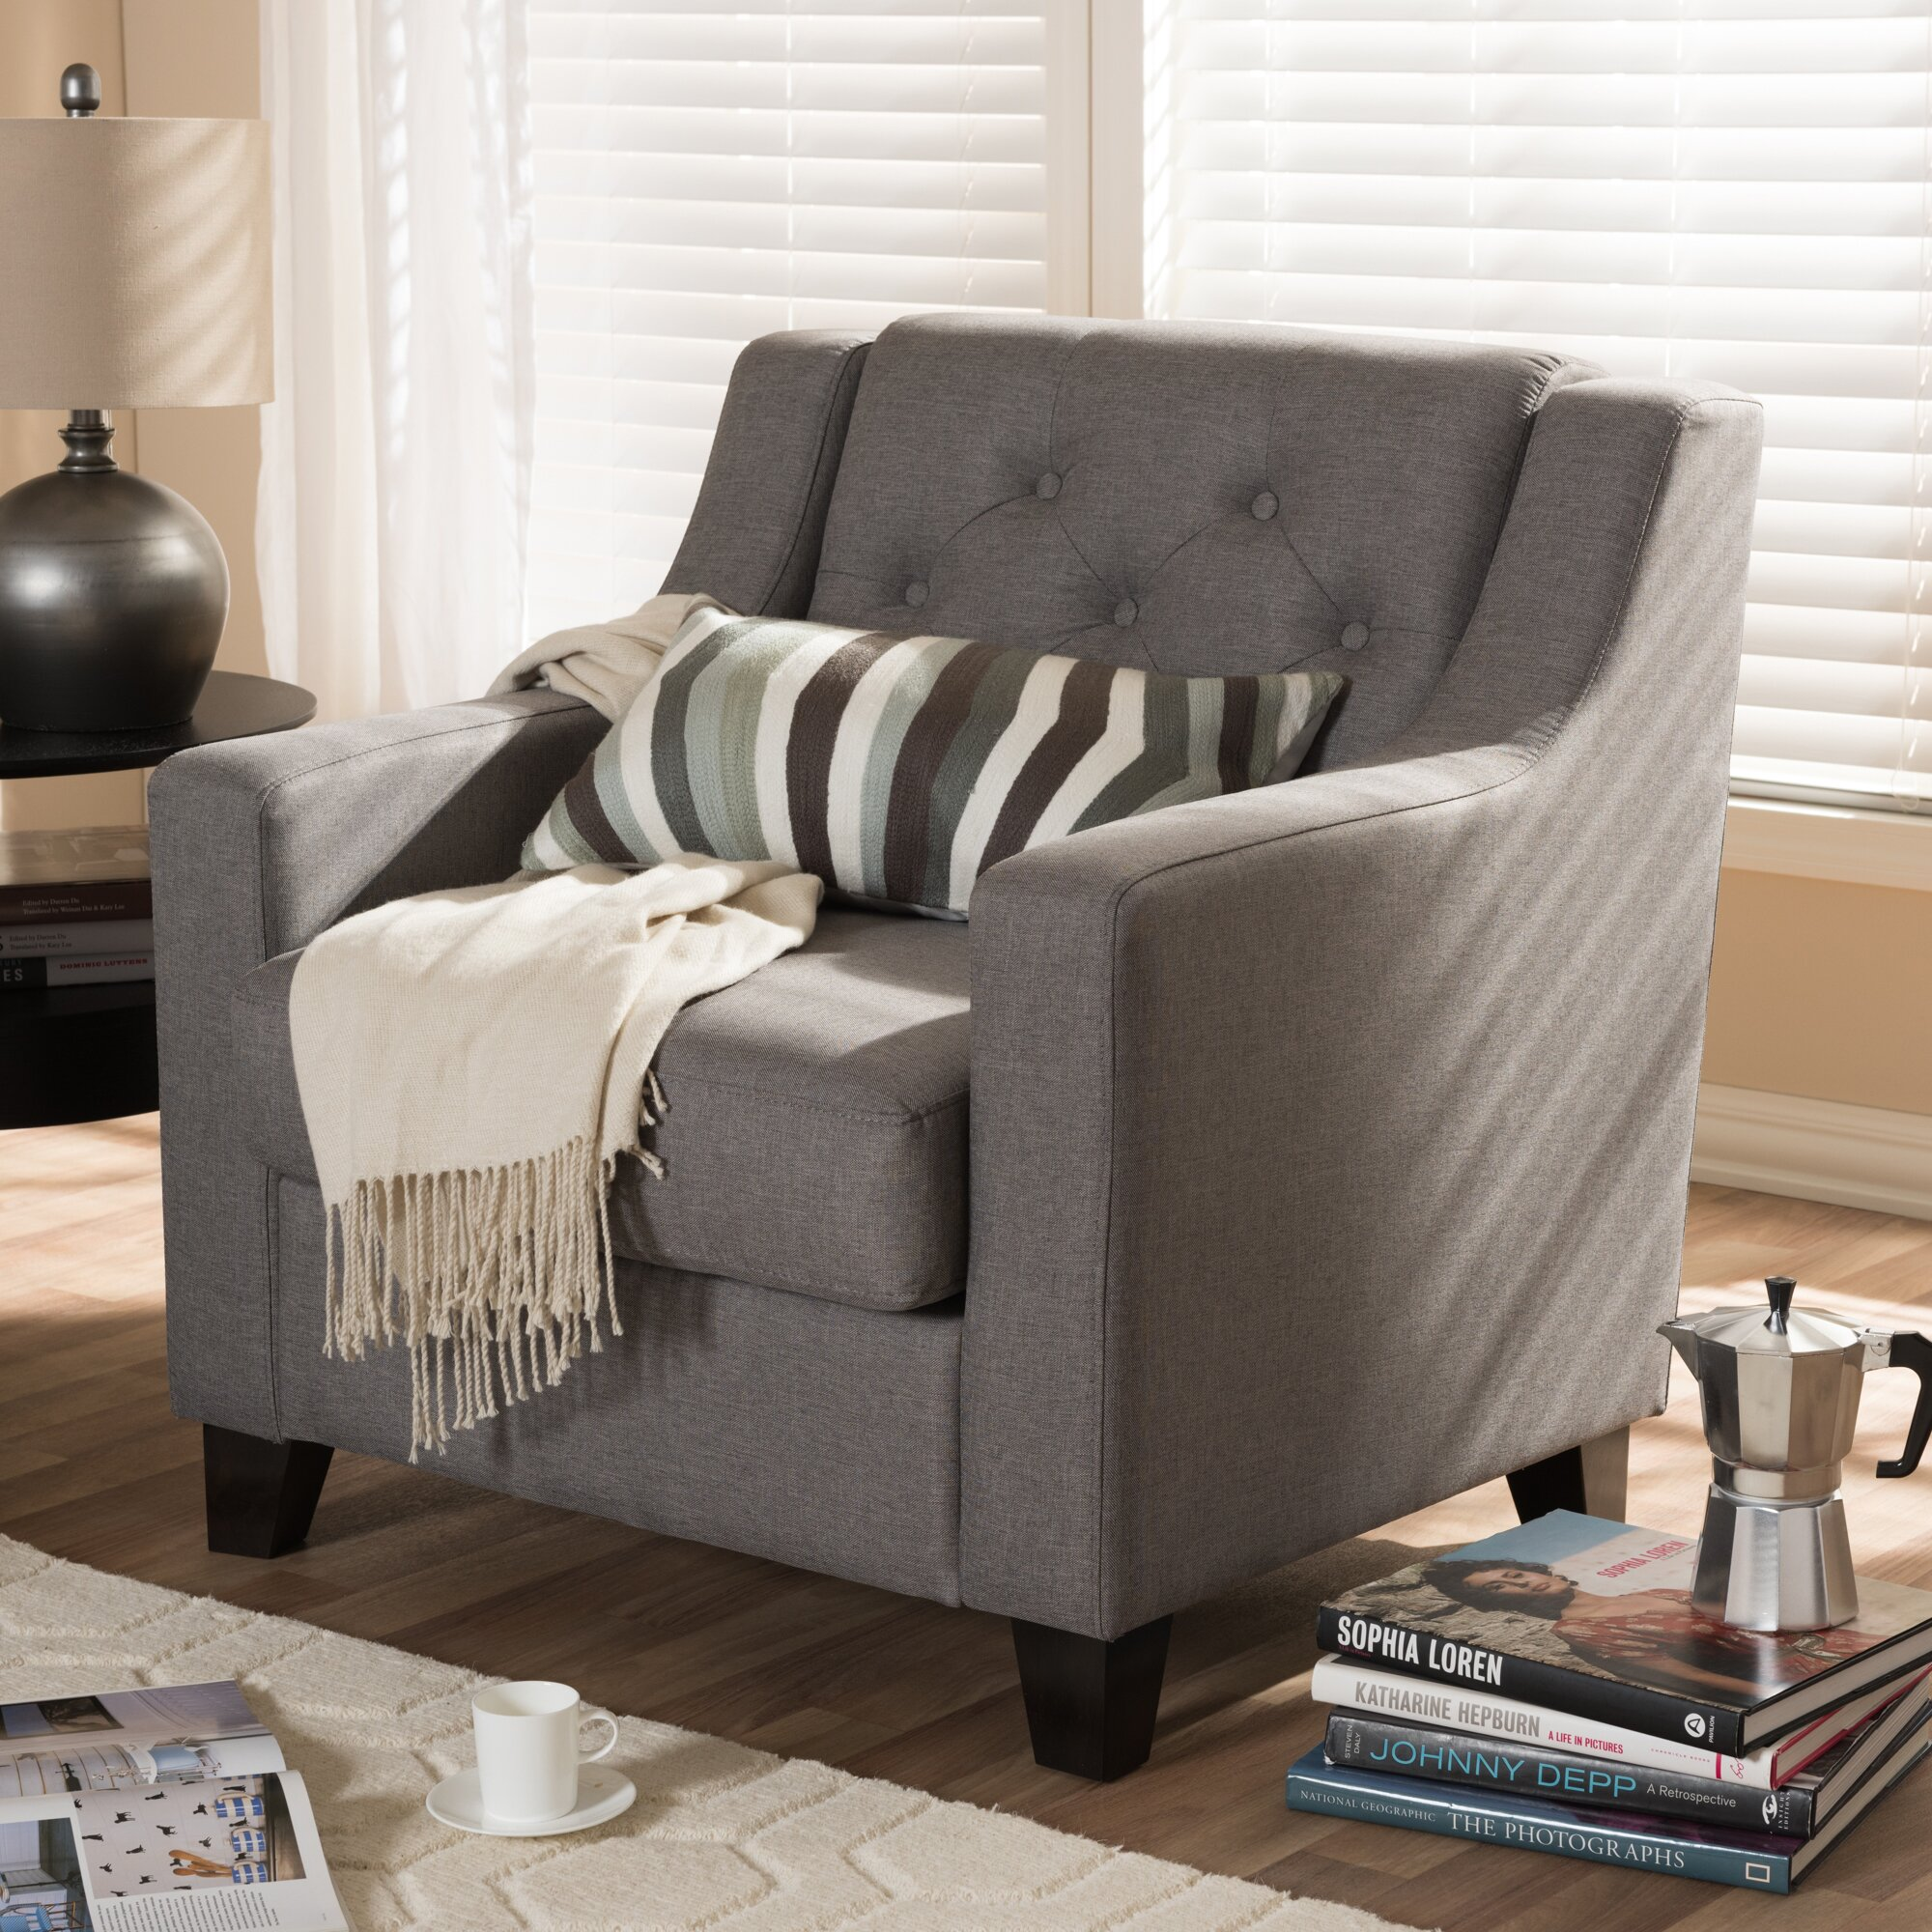 Living Room Couch Set Wholesale Interiors Baxton Studio Silvia 3 Piece Living Room Sofa